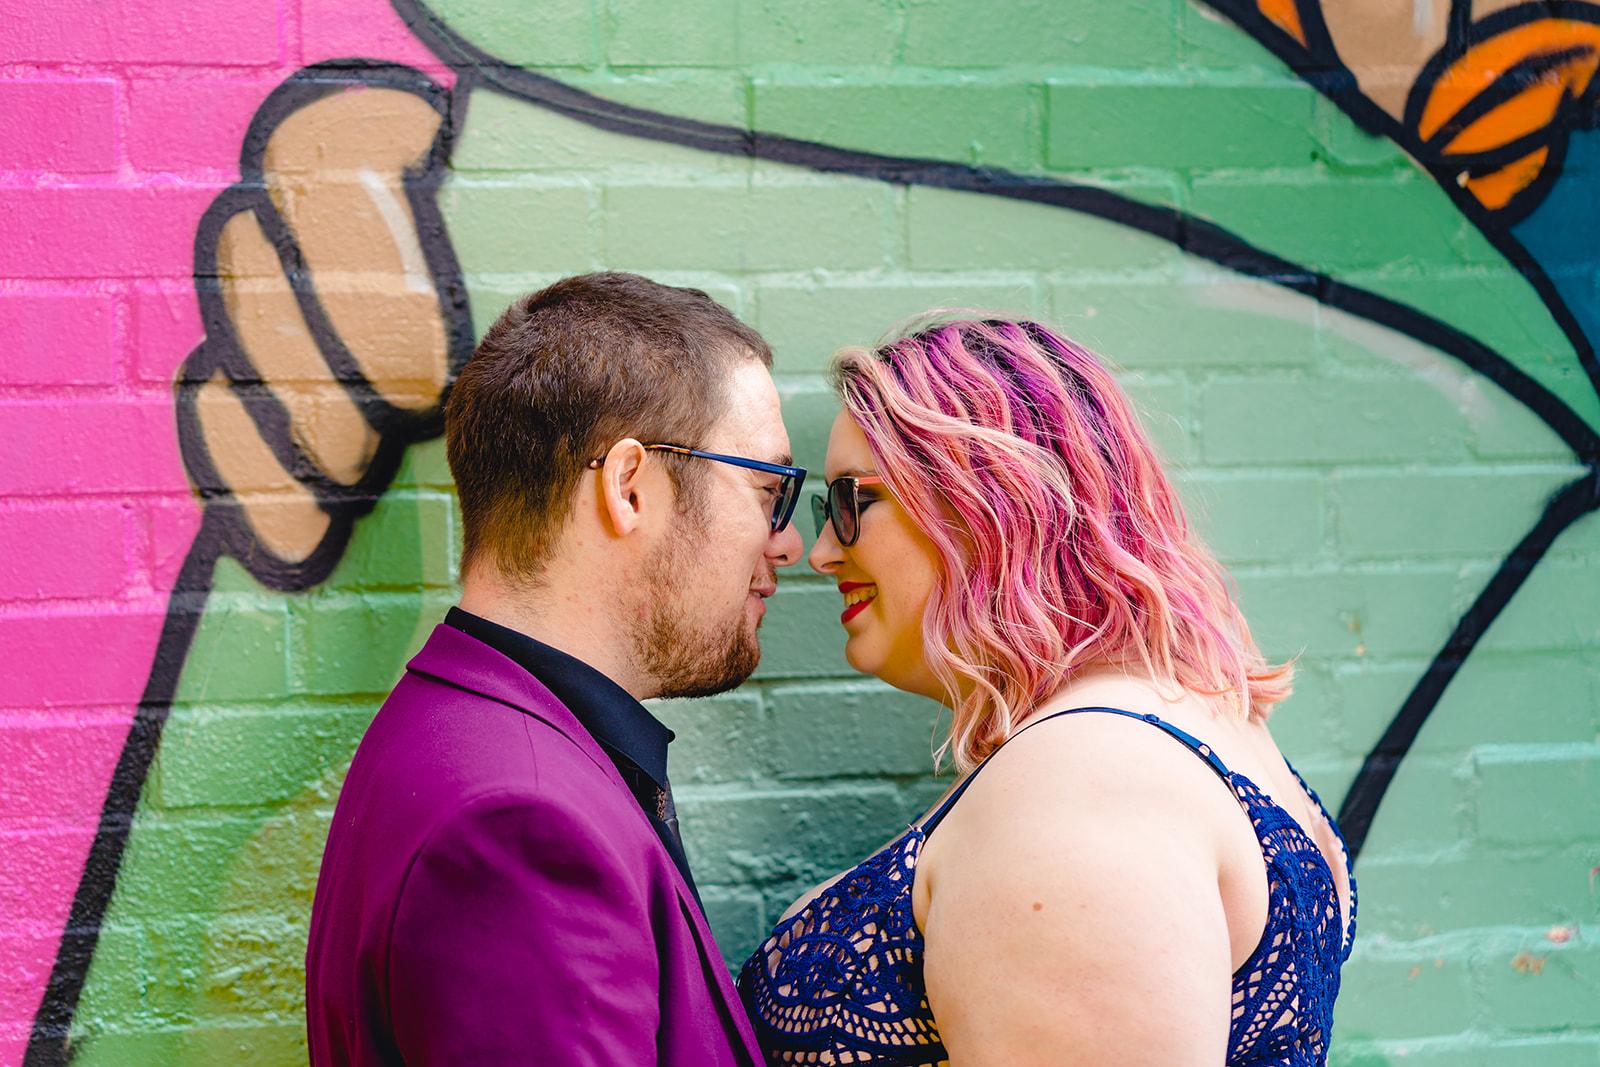 engagement shoots - birmingham engagement shoot - colourful wedding photoshoot - quirky wedding photos - fun wedding photography - alternative wedding